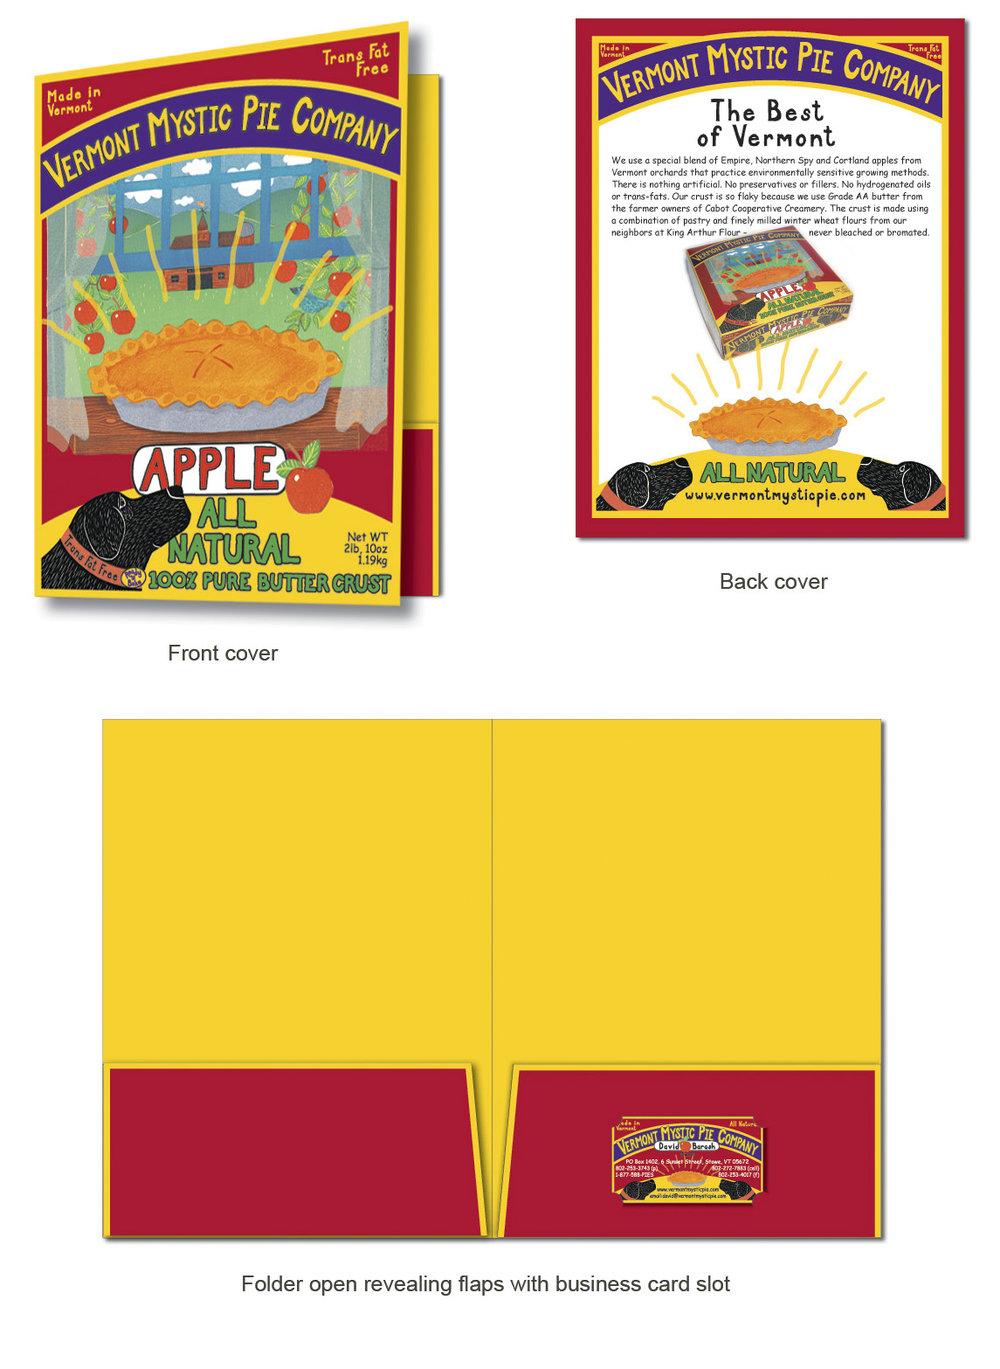 Sales kit folder